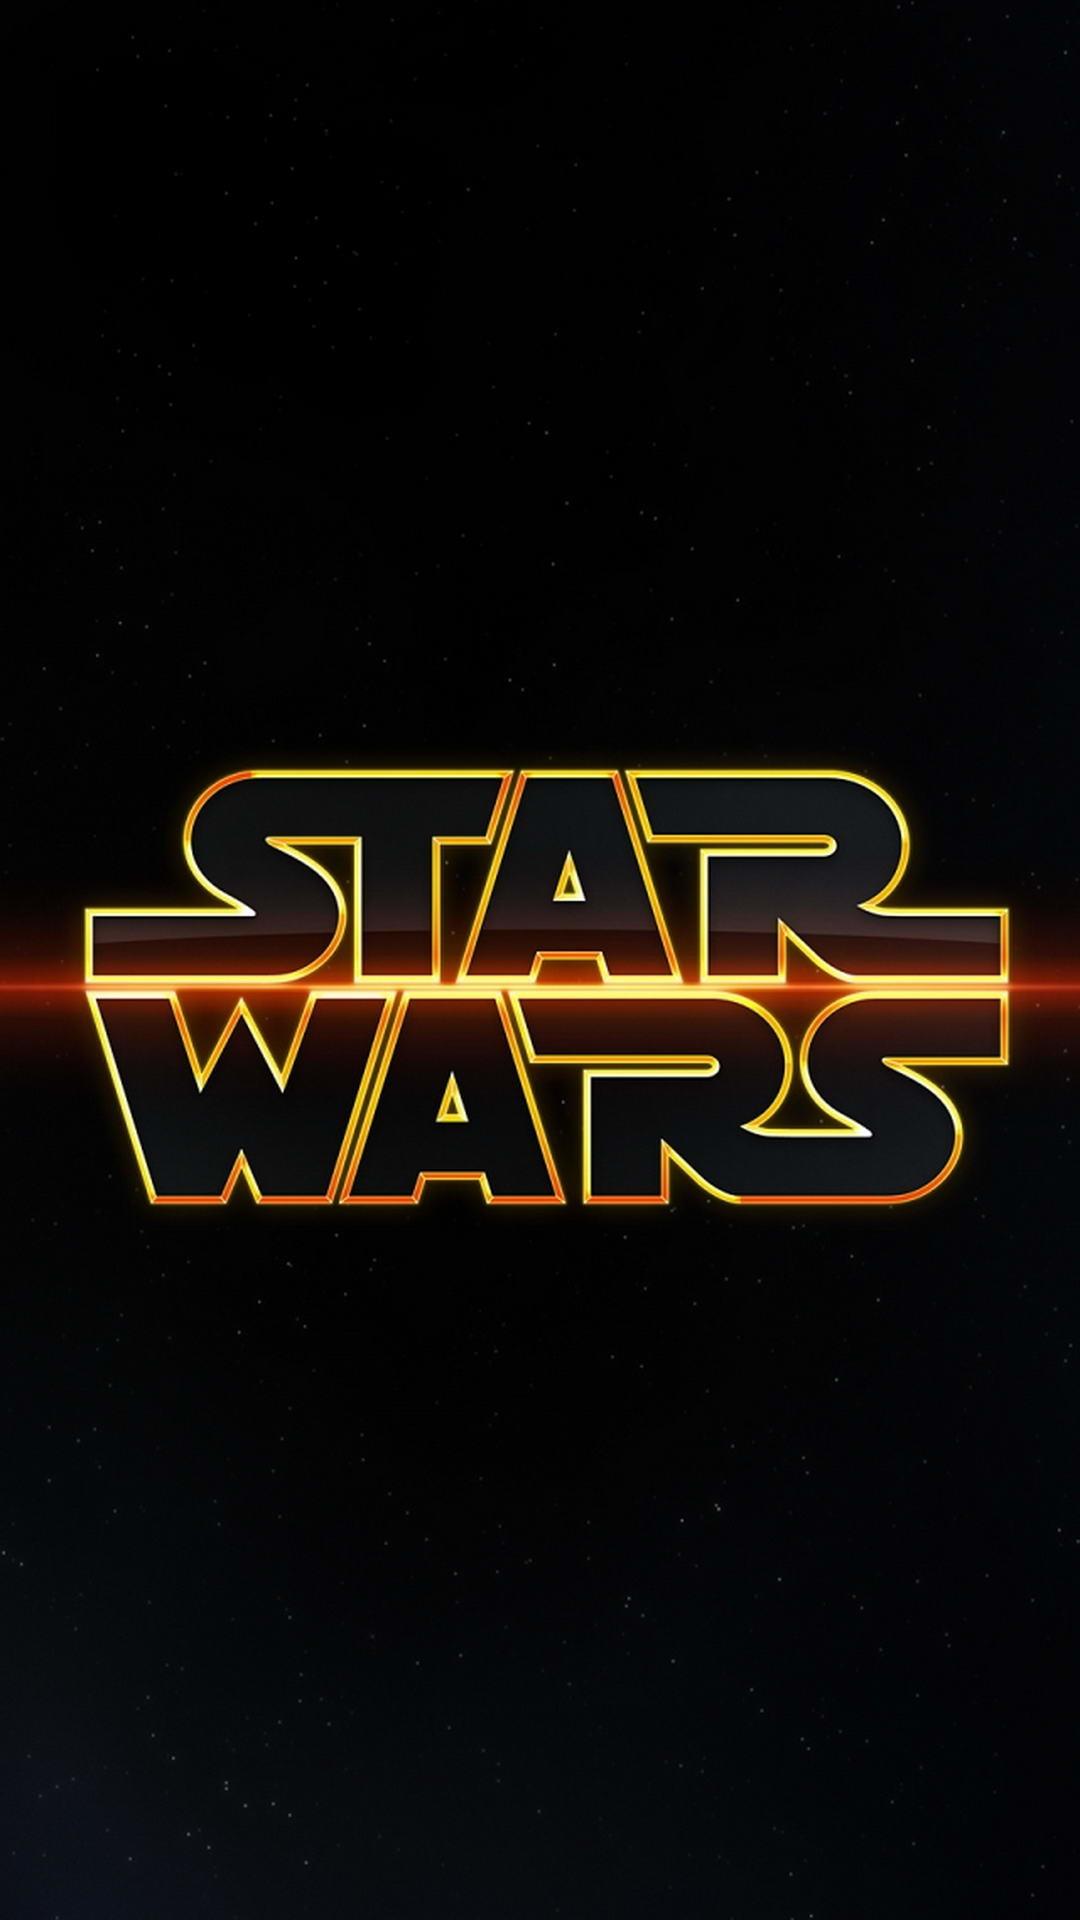 Star Wars Logo ☆ Download more Star Wars iPhone Wallpapers at  @prettywallpaper Luke Skywalker!